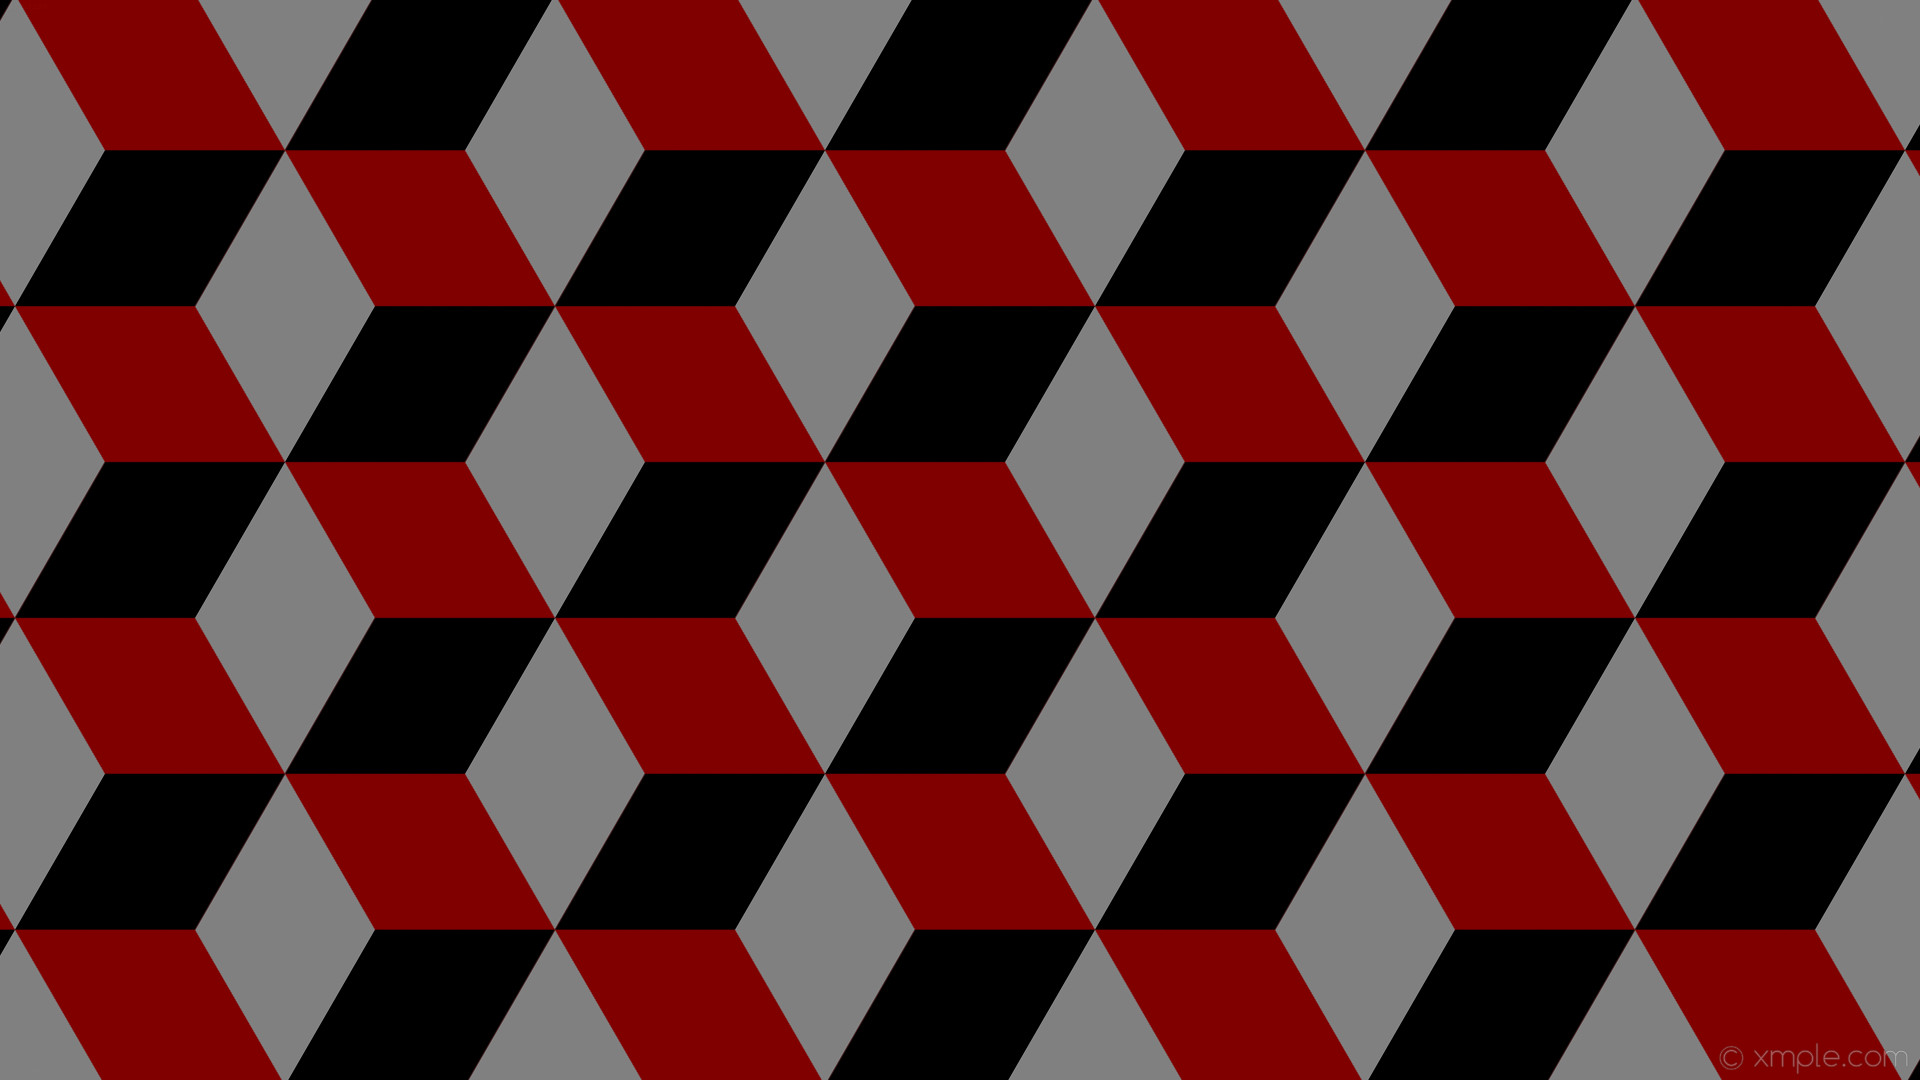 wallpaper black grey 3d cubes brown maroon gray #800000 #808080 #000000 150°